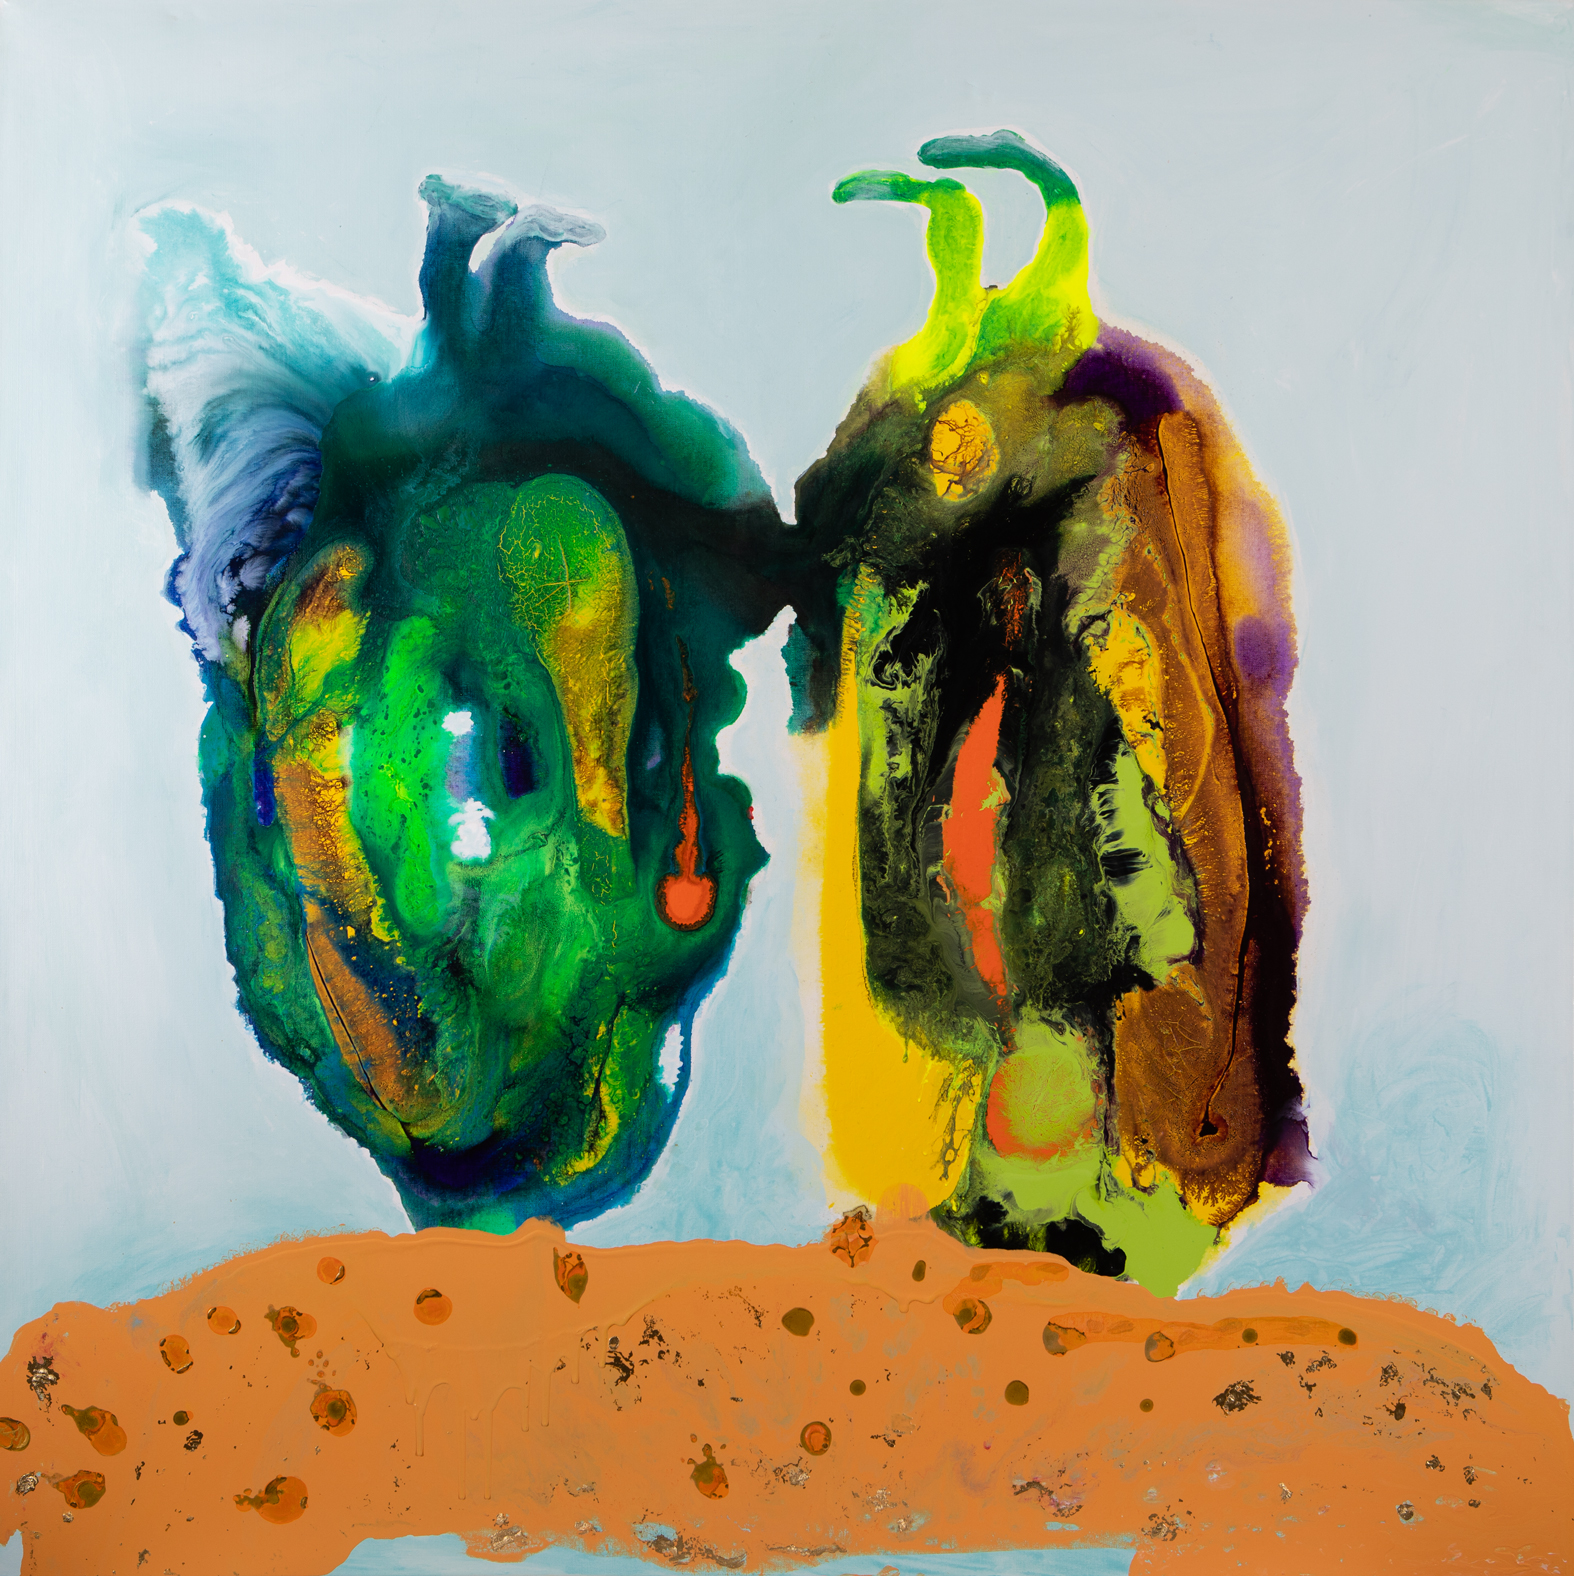 Kopf in den Sand - Acryl auf Leinwand120 x 120 cm